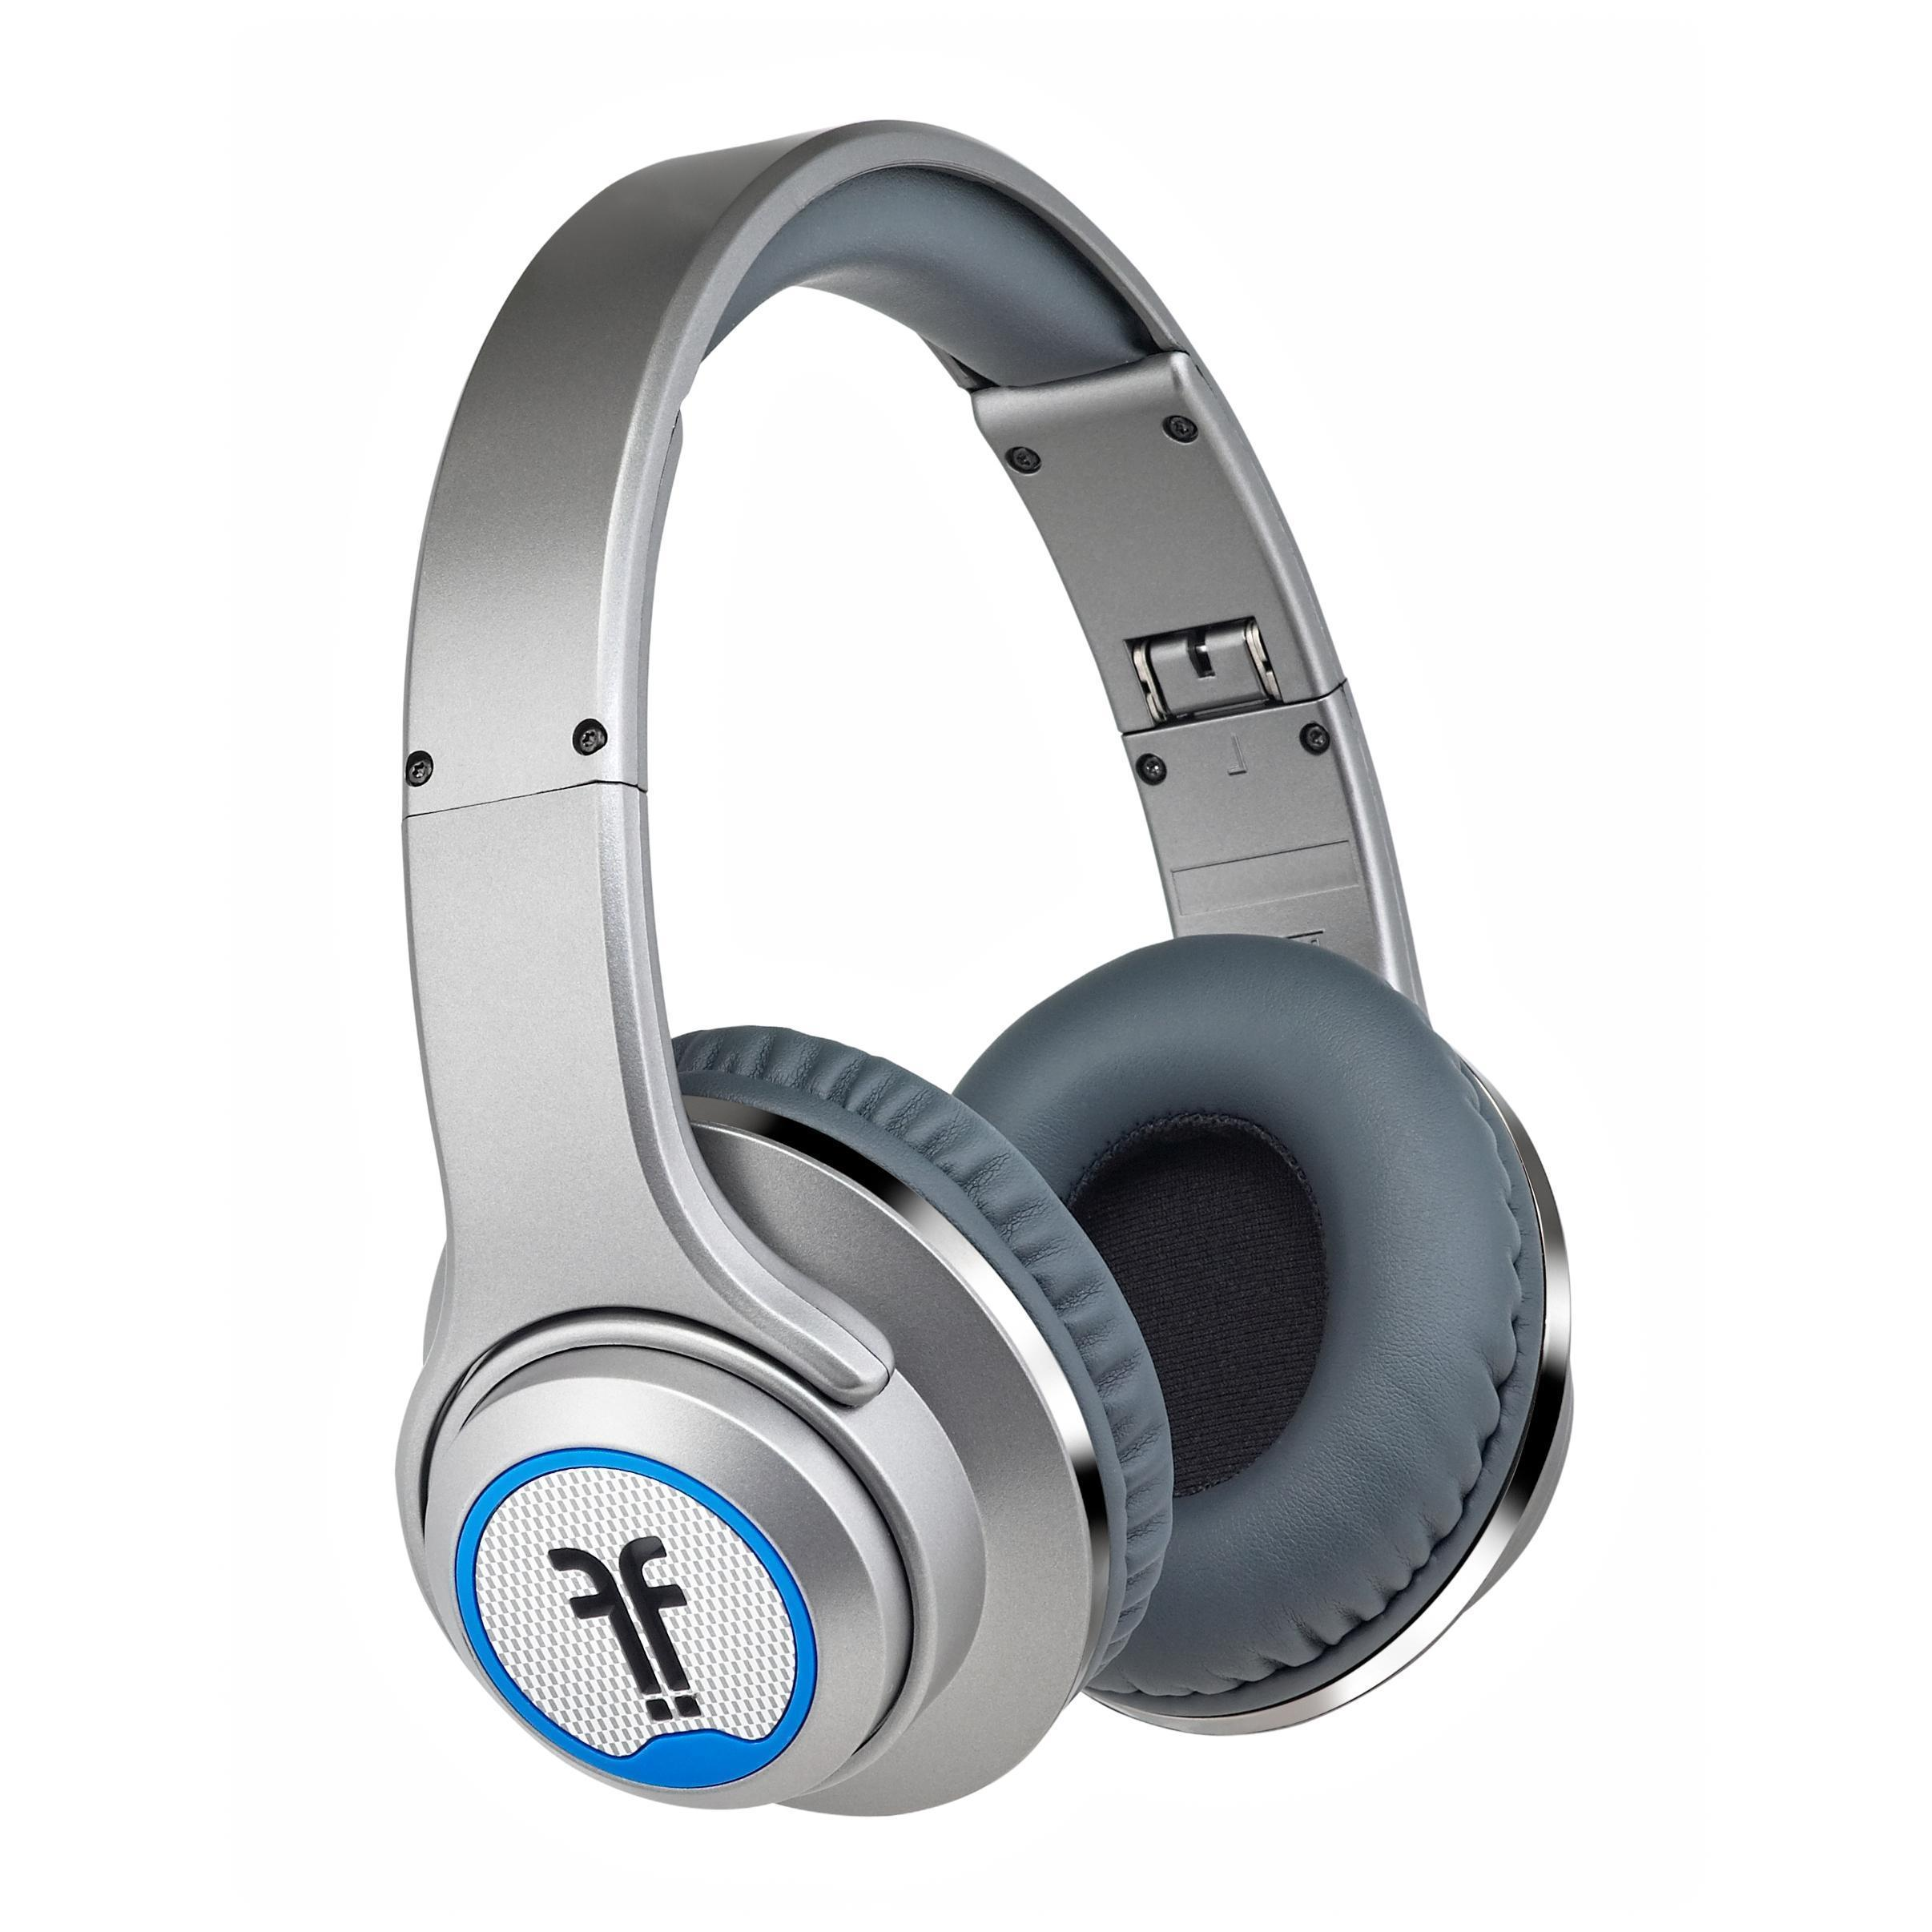 Flips Audio XB Μειωτής θορύβου Ακουστικά Μικρόφωνο - Γκρι